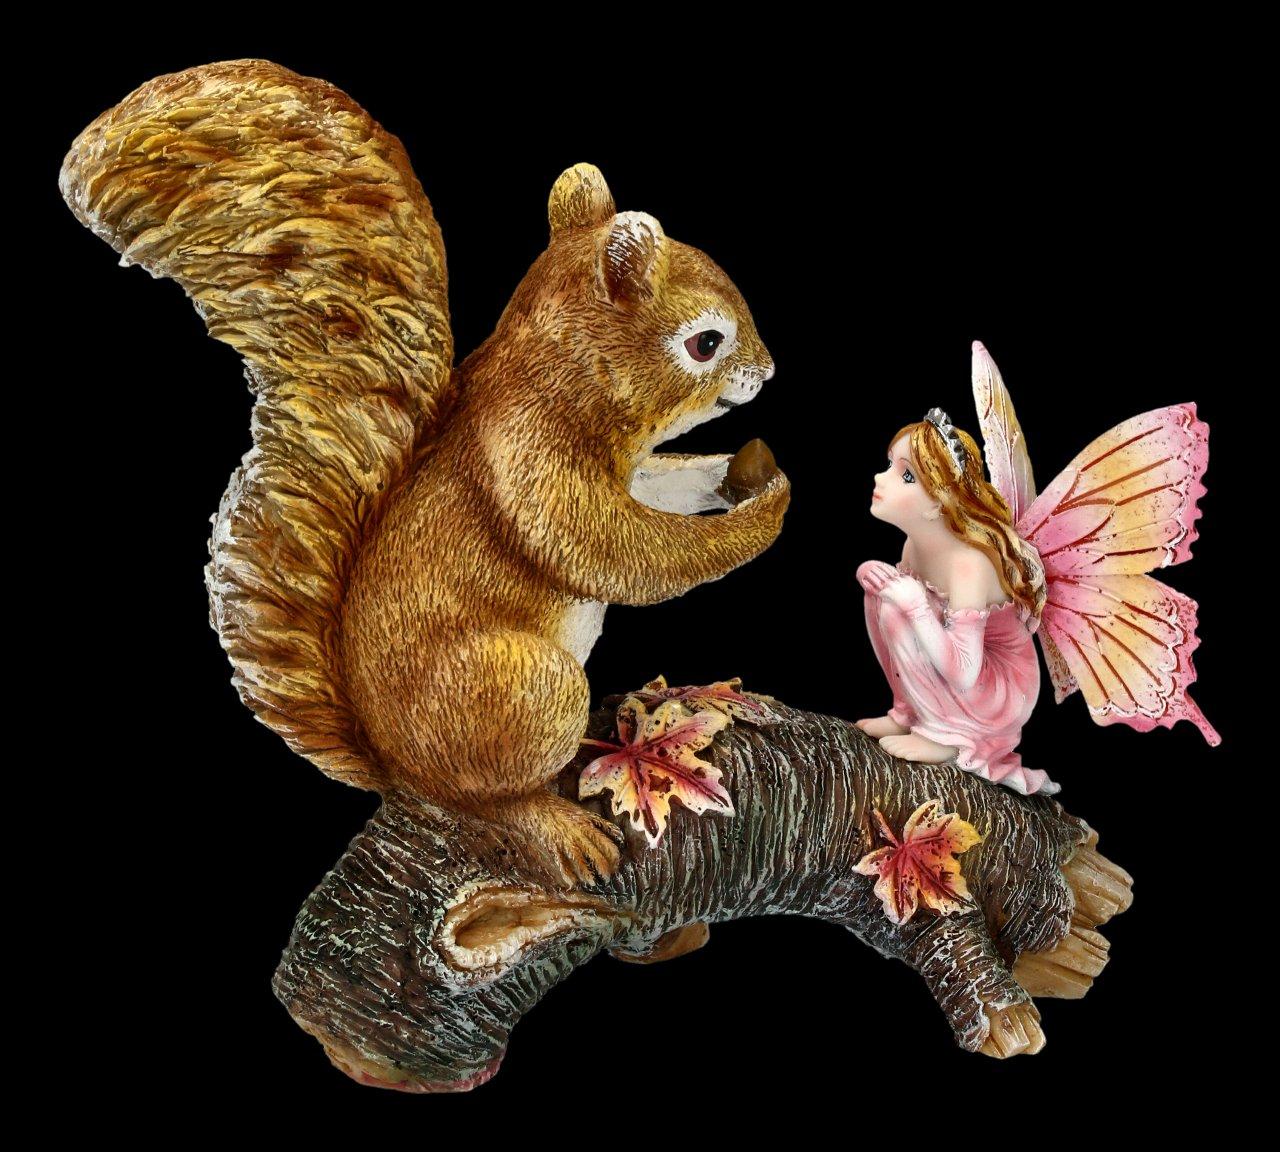 Forest Fairy Figurine - Animalia with Squirrel